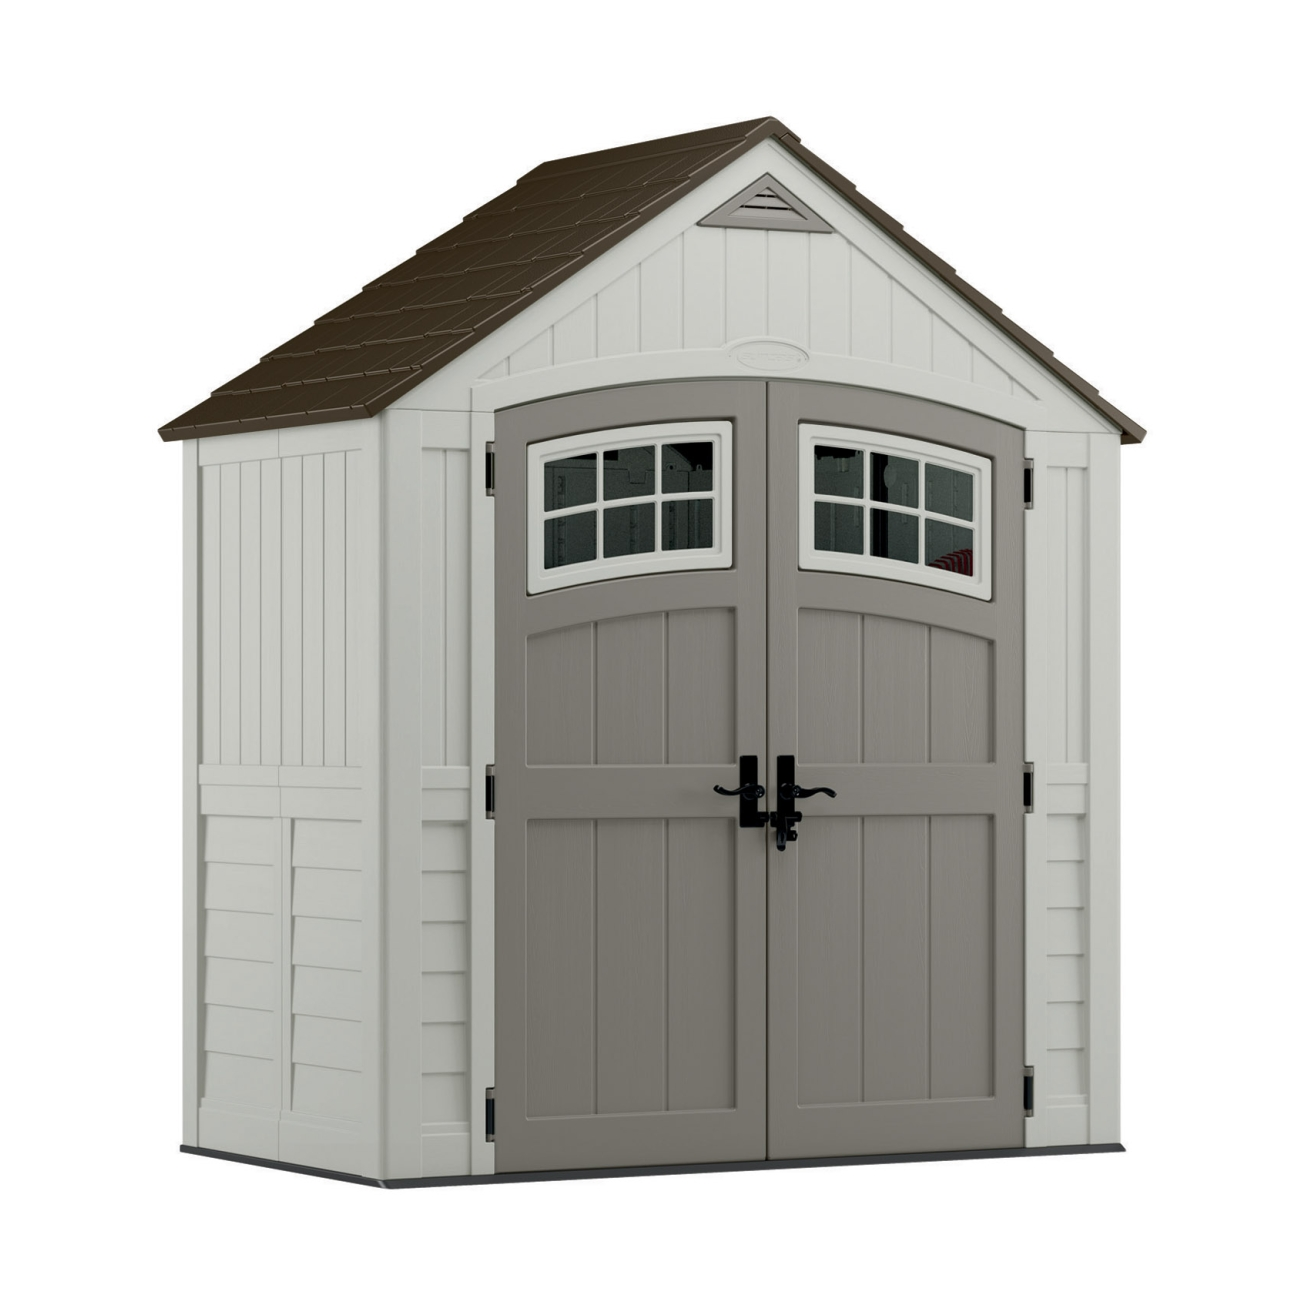 storage sheds suncast 7ft x 4ft cascade resin storage shed (bms7400) - ace hardware NRGLZKA